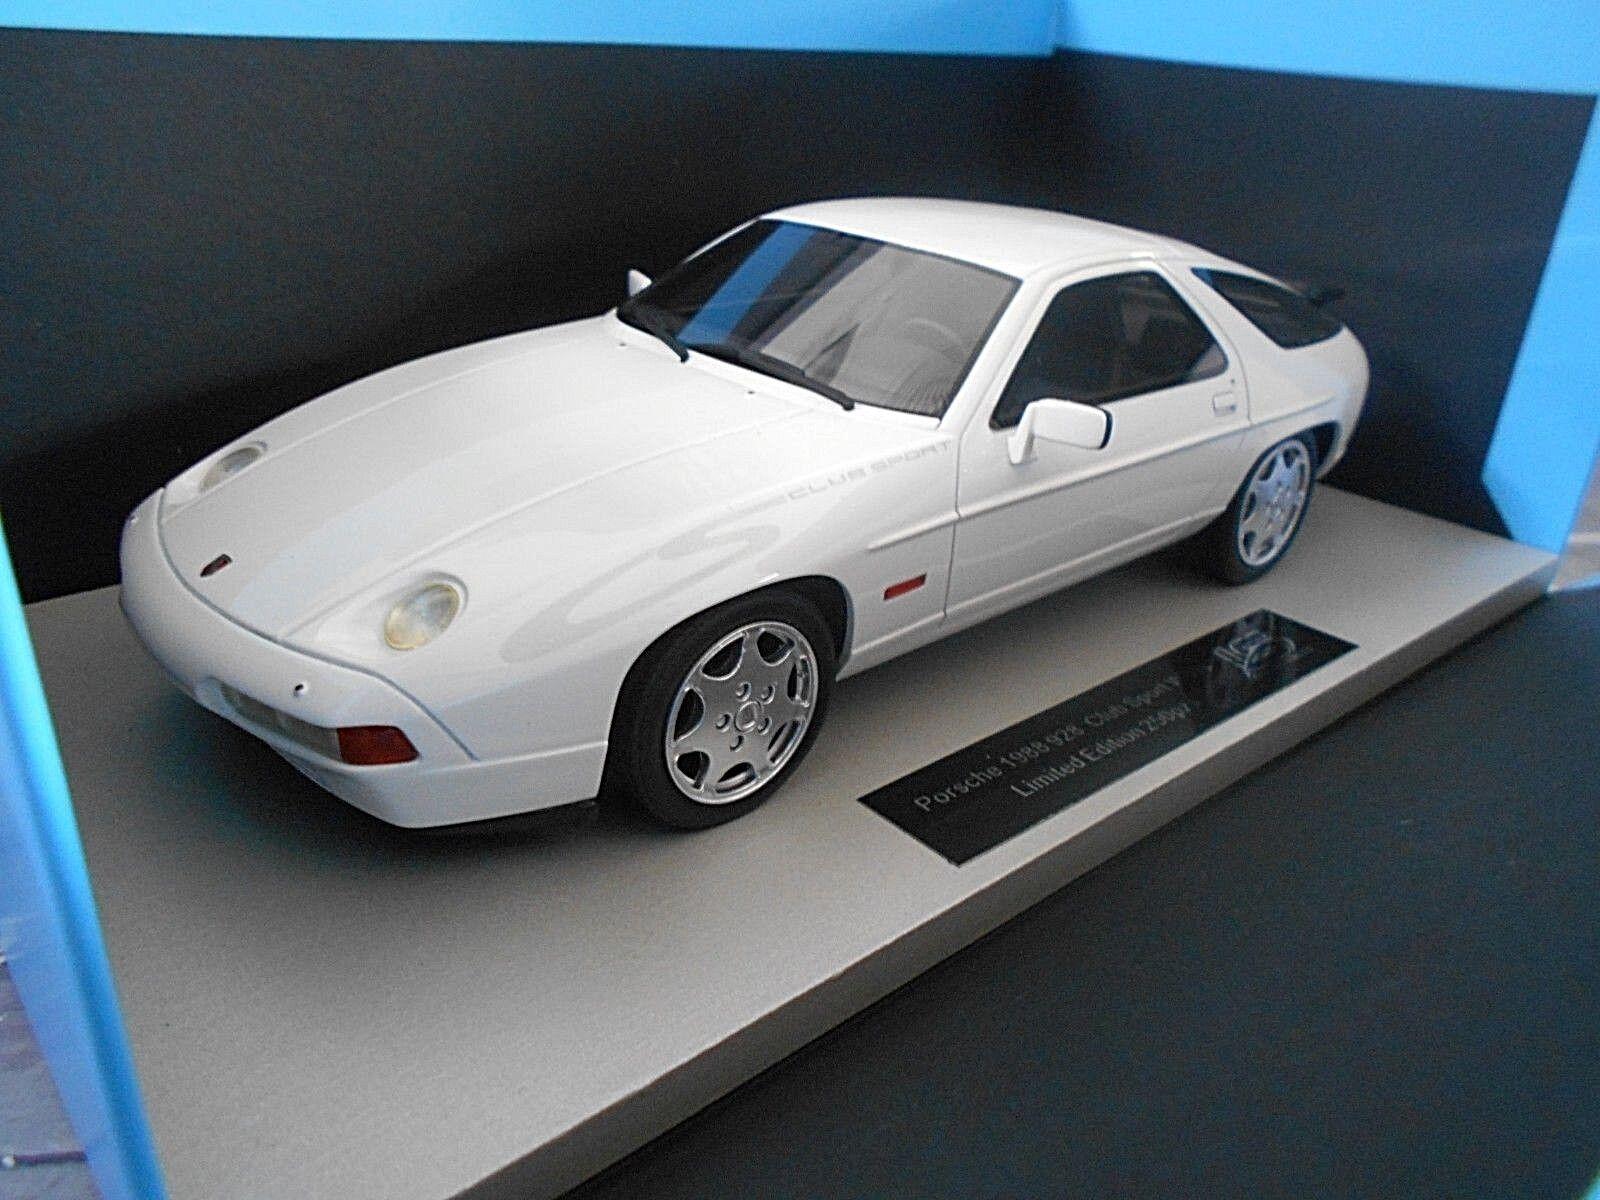 PORSCHE 928S 928 S4 CS Club Sport Sport Sport white w LS Collectibles Resin Highend SP 1 18 98f3ec